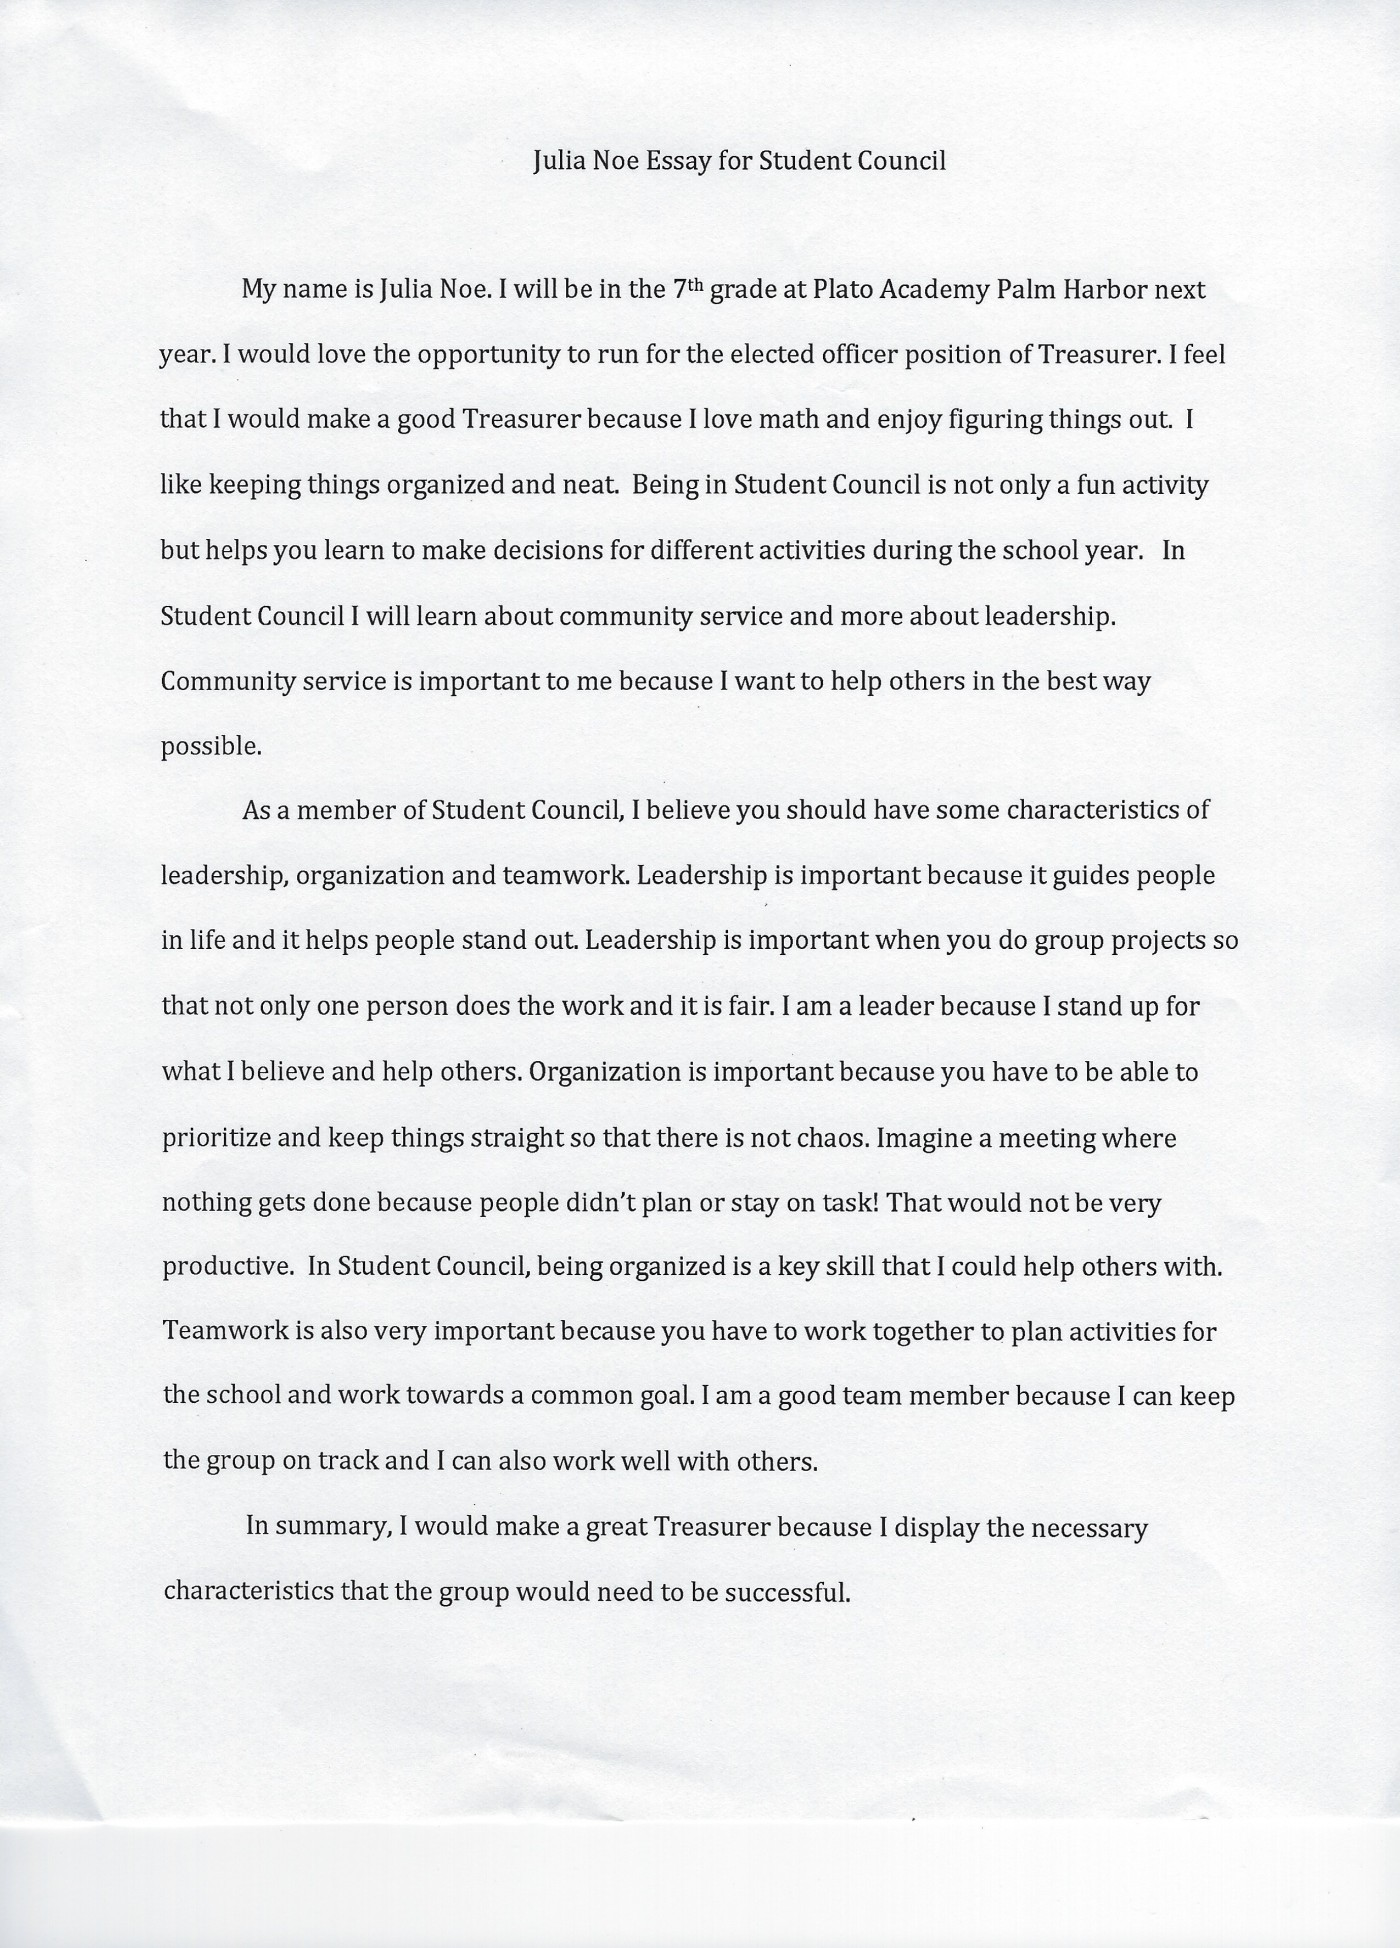 009 Student Council Essay Example Treasurer Noe Phenomenal Rubric President Conclusion 1400